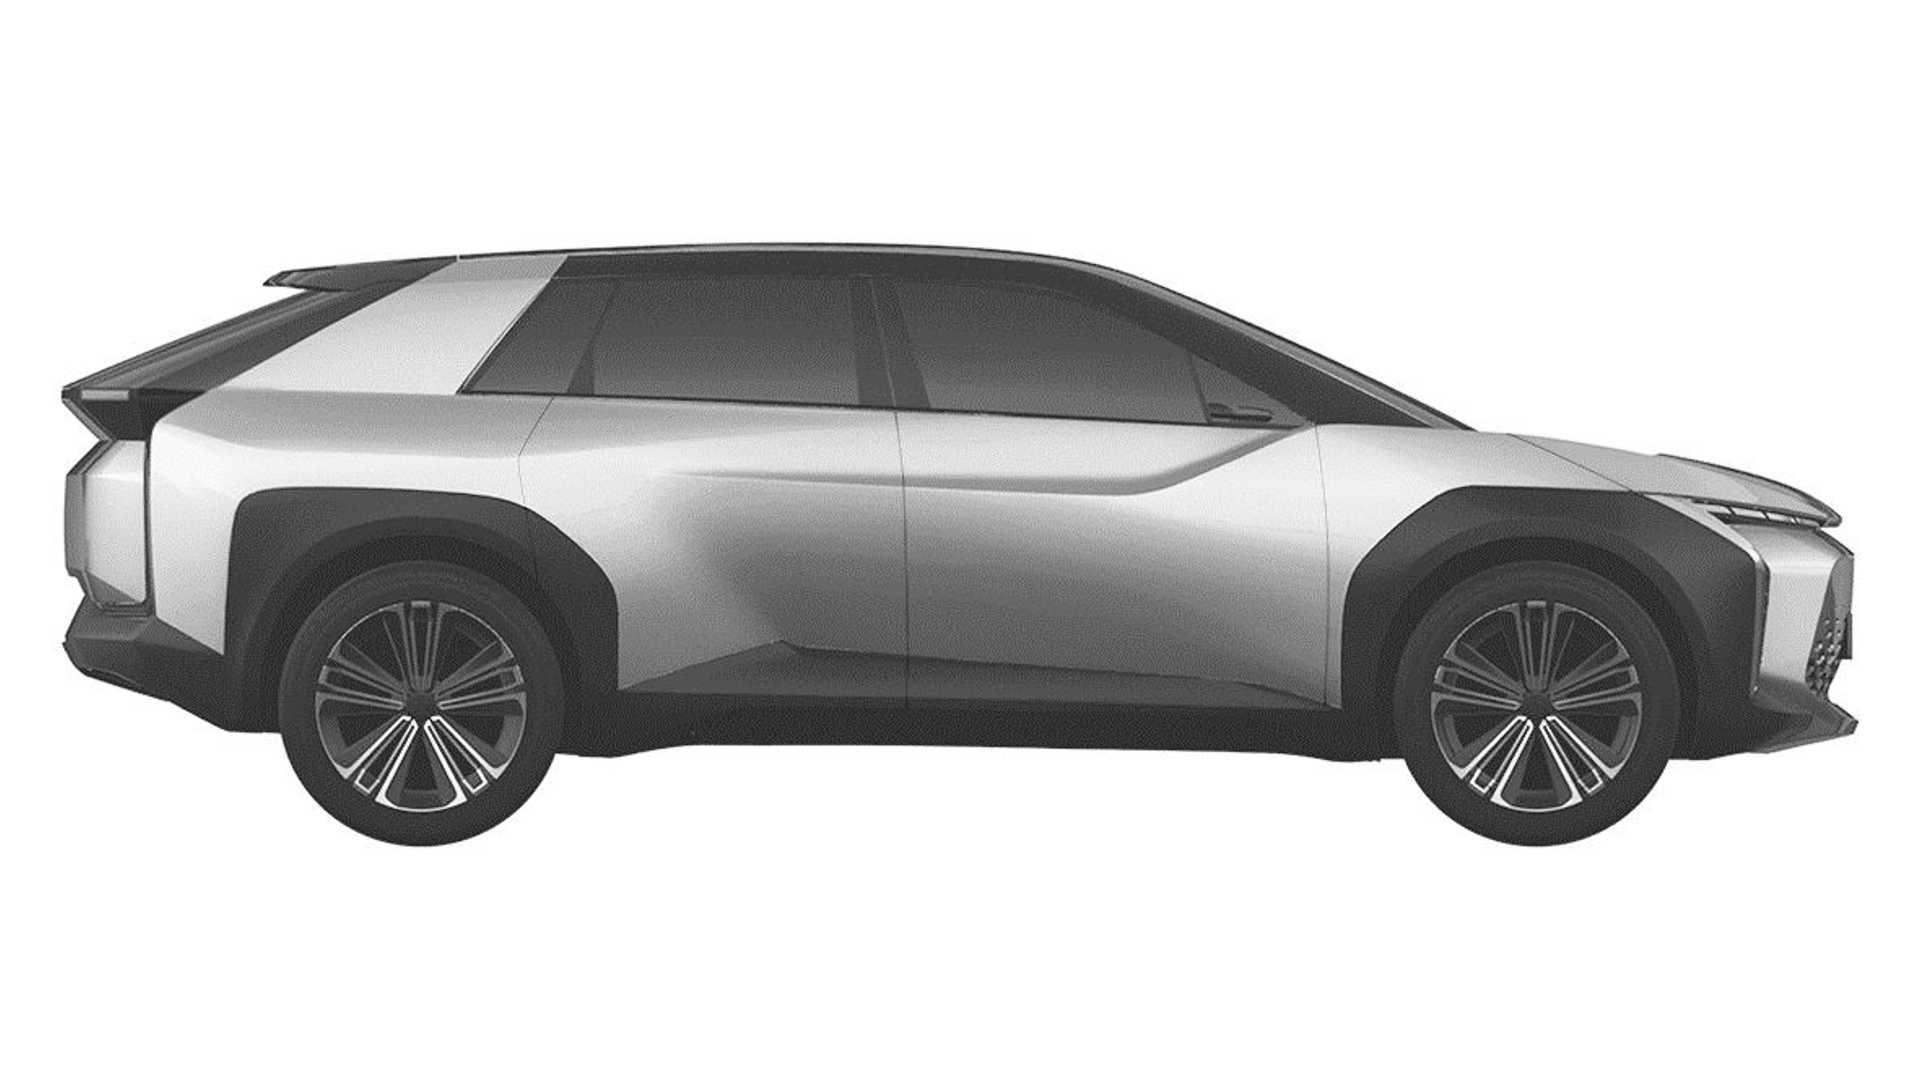 Toyota-Crossover-Design-Trademark-patents-5